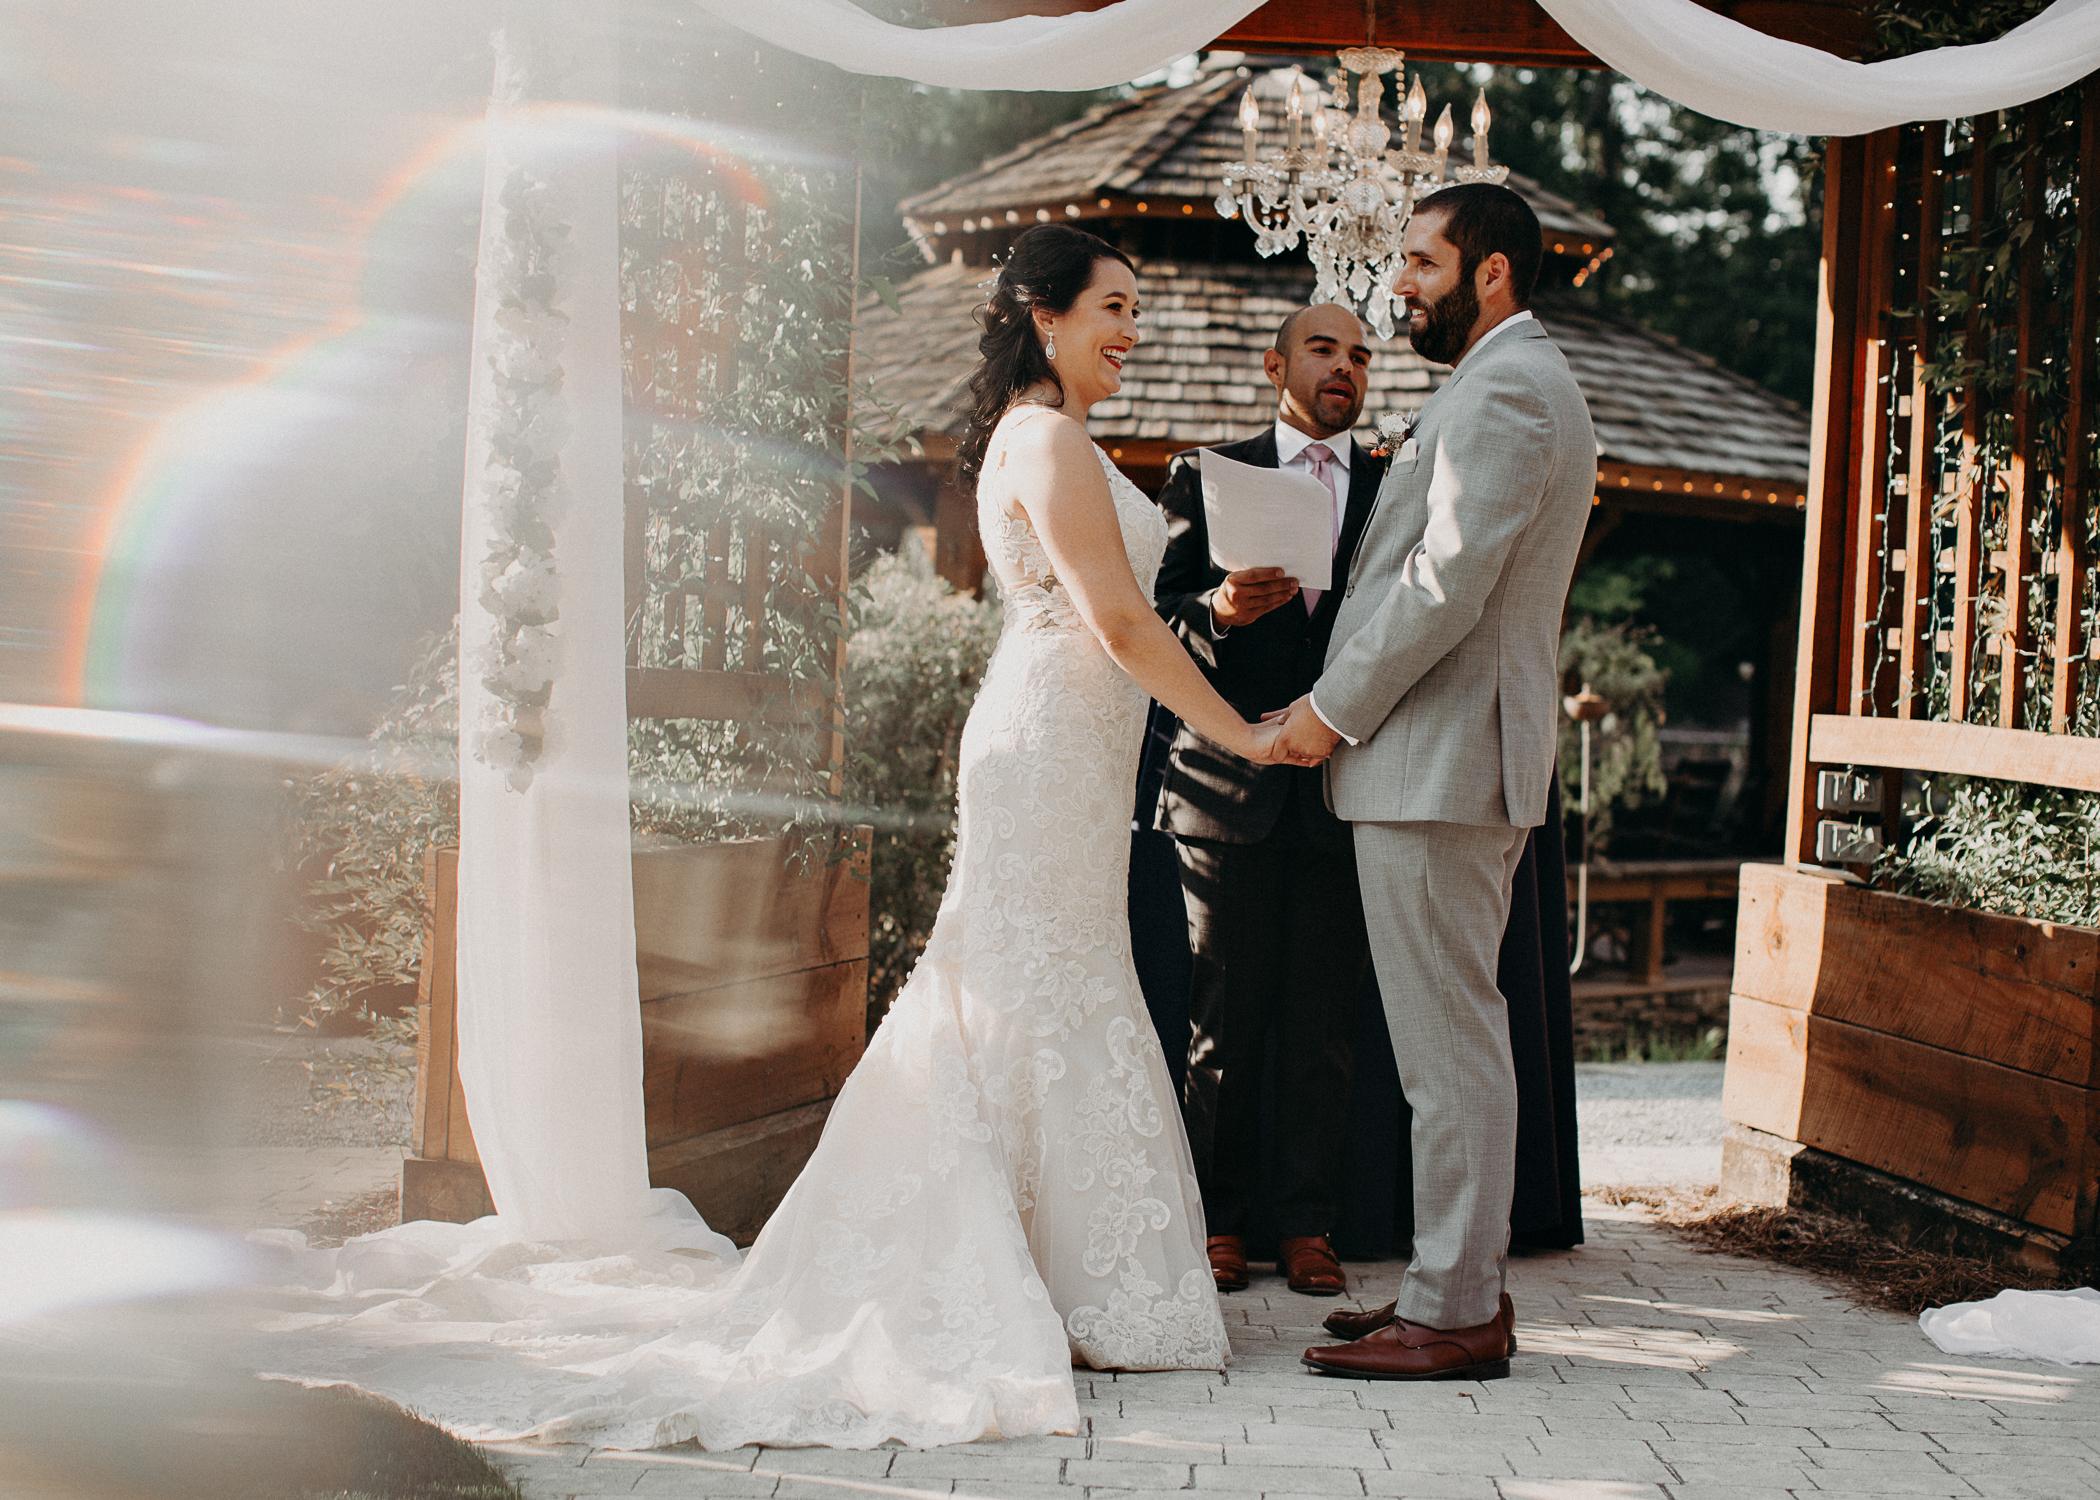 69  wedding day portraits bride and groom atlanta - georgia - ga wedding details - photographer .jpg